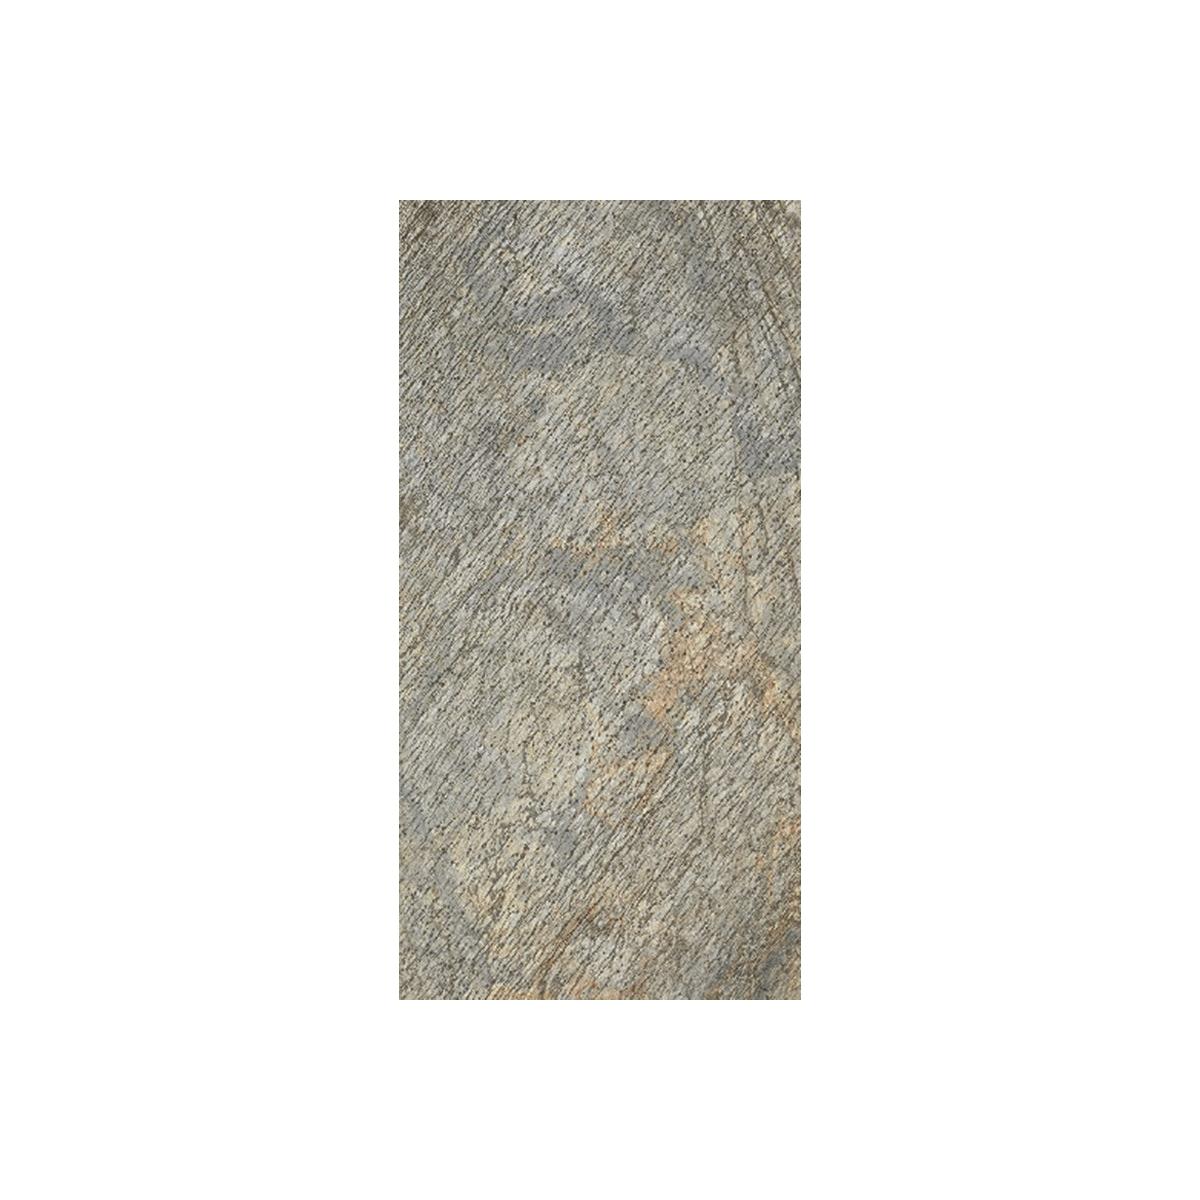 Pizarra natural flexible FS6005 / FT3005